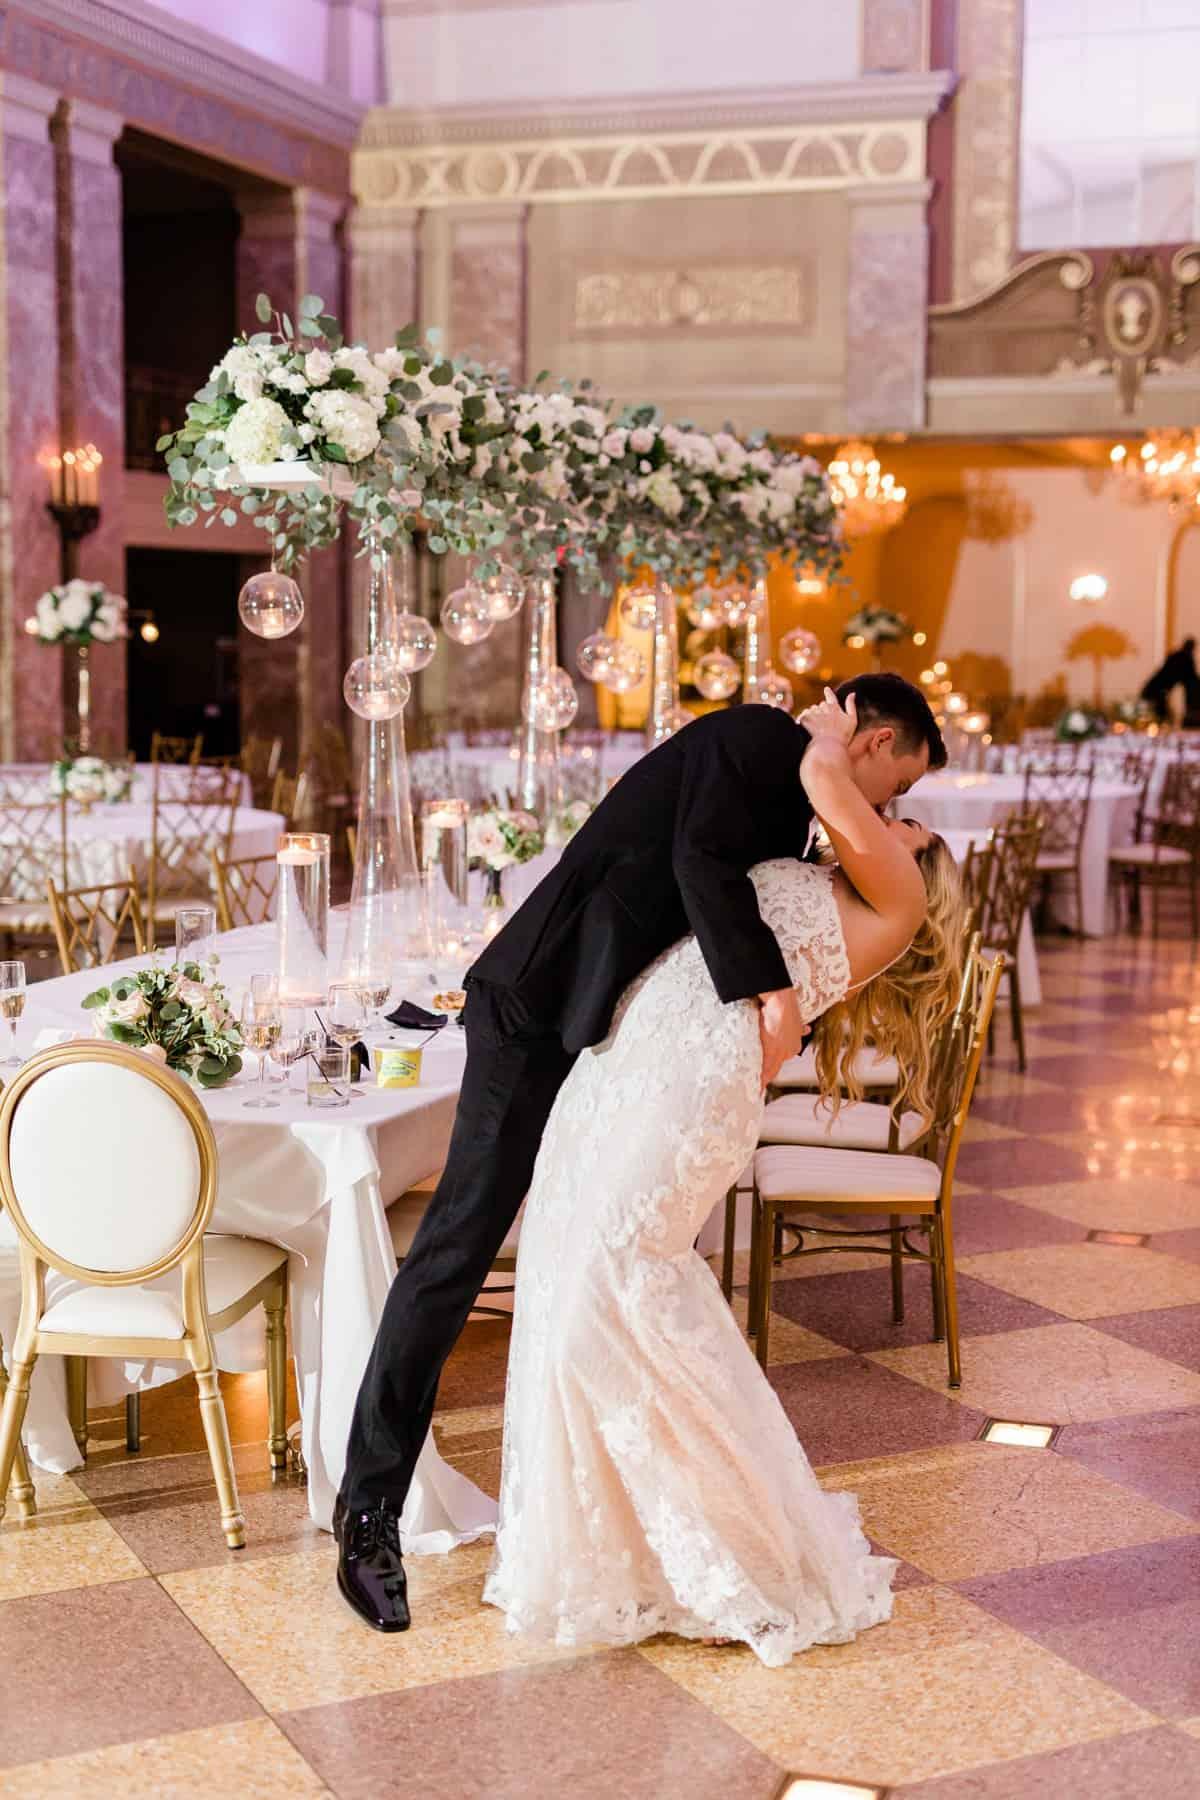 The Coronado Wedding Reception, St. Louis Wedding Photographer